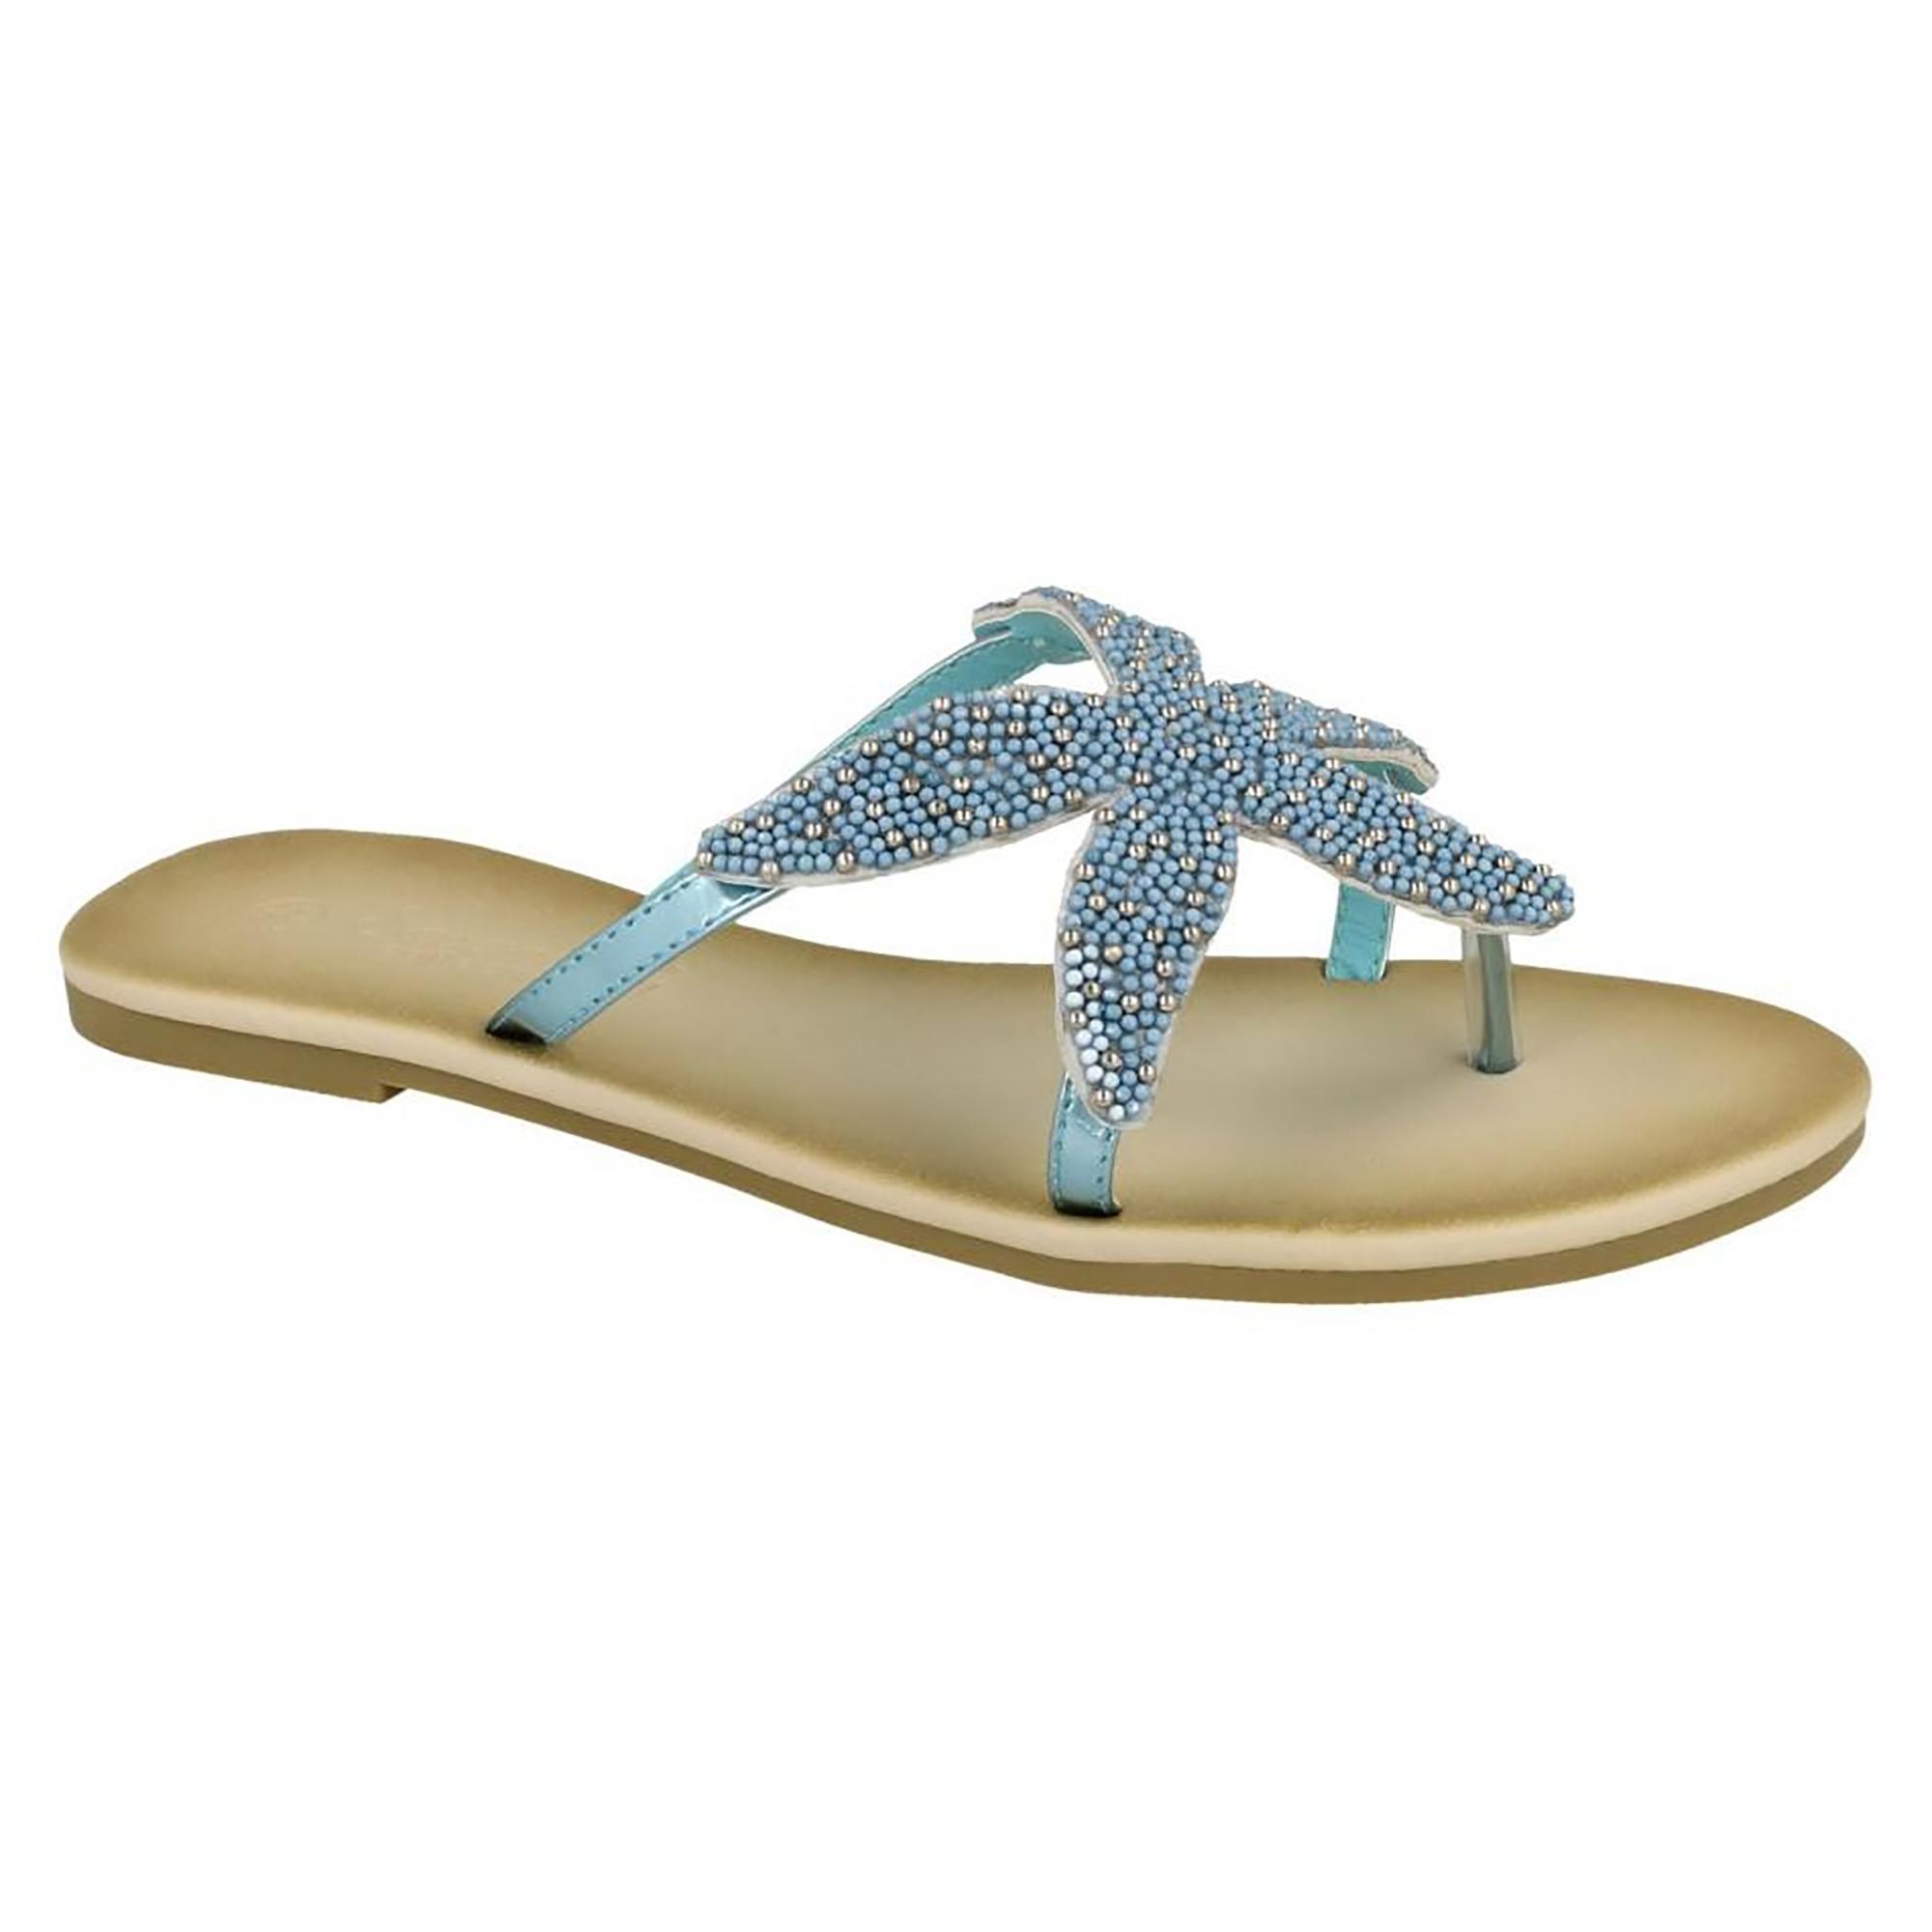 Savannah Damen Starfish Perlen Flip Flops (38 EU) (Gold) zsUgrW